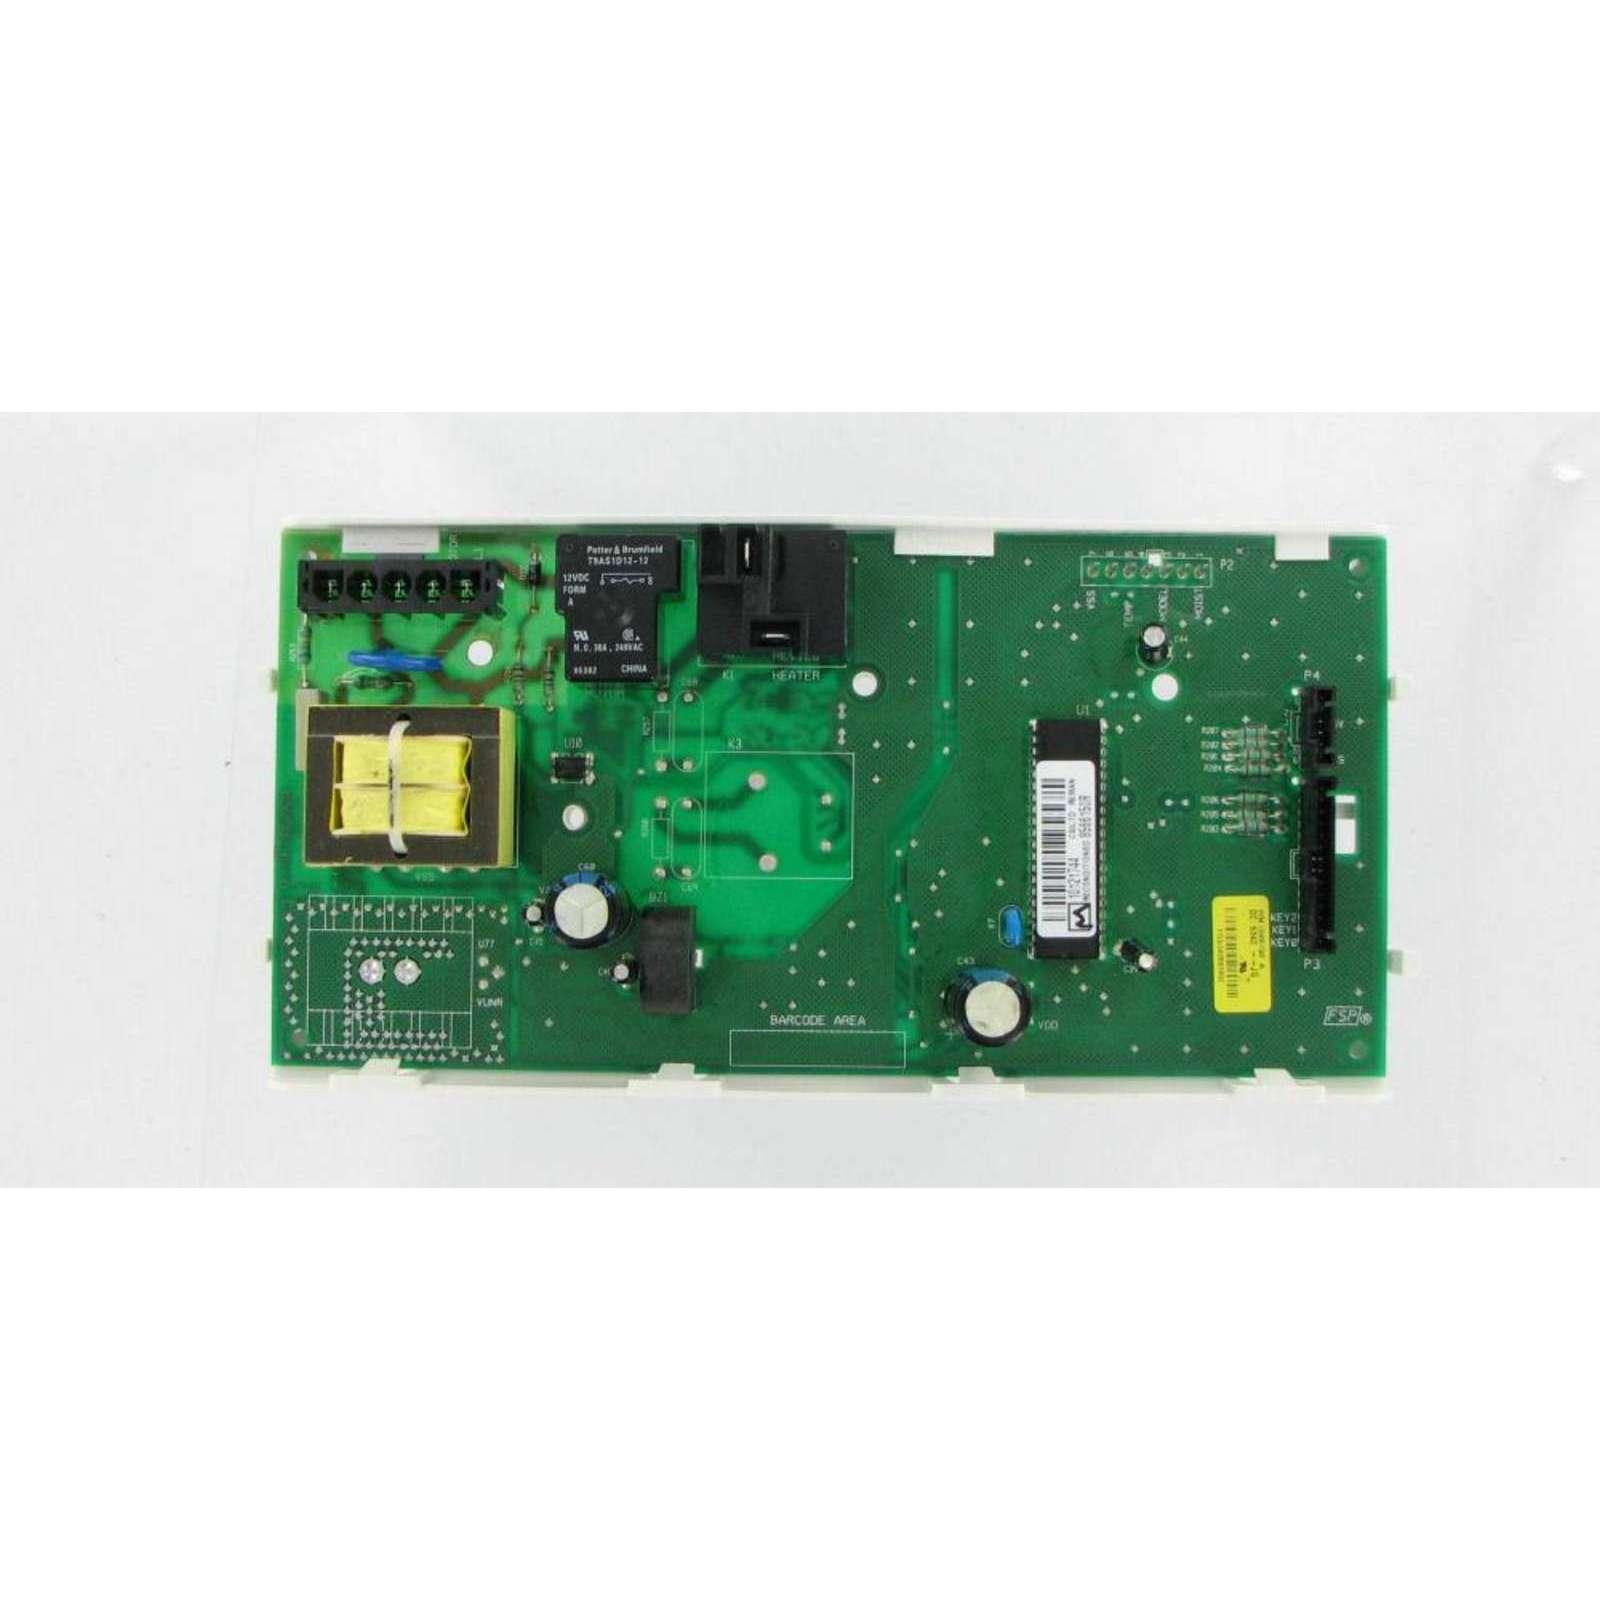 PREMIUM POWER 8566150R Whirlpool Dryer Control Board FAST